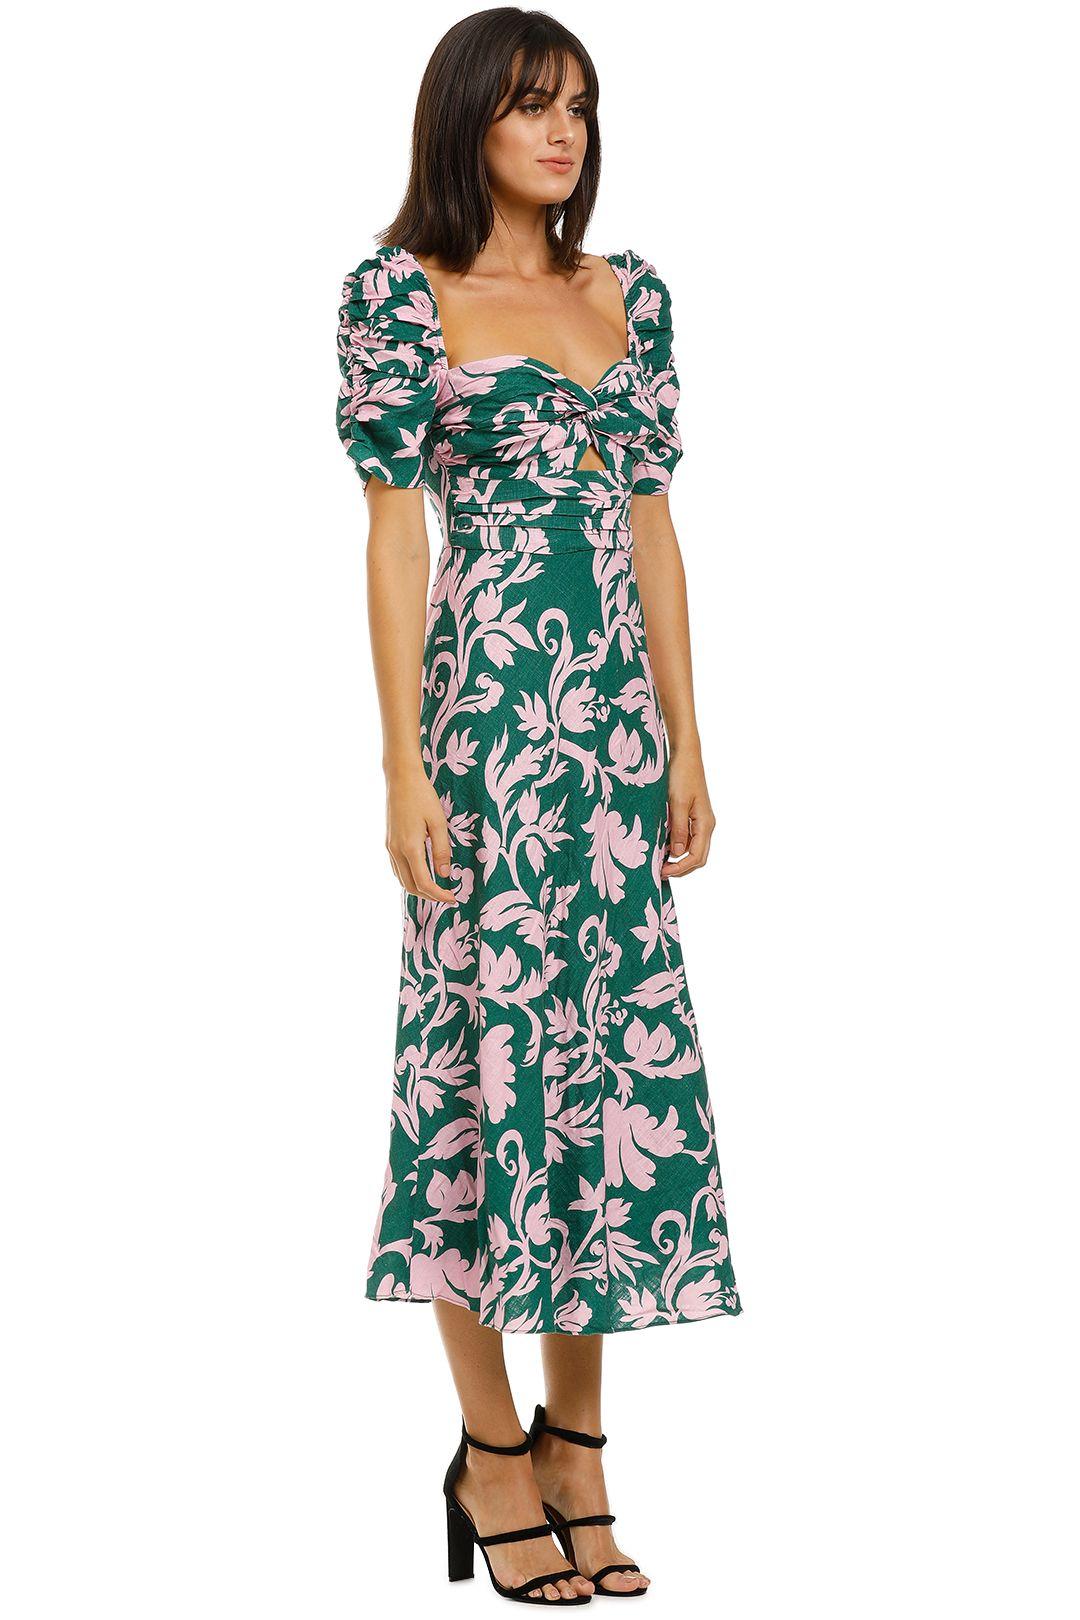 Keepsake-the-Label-Wistful-Midi-Dress-Jade-Baroque-Side